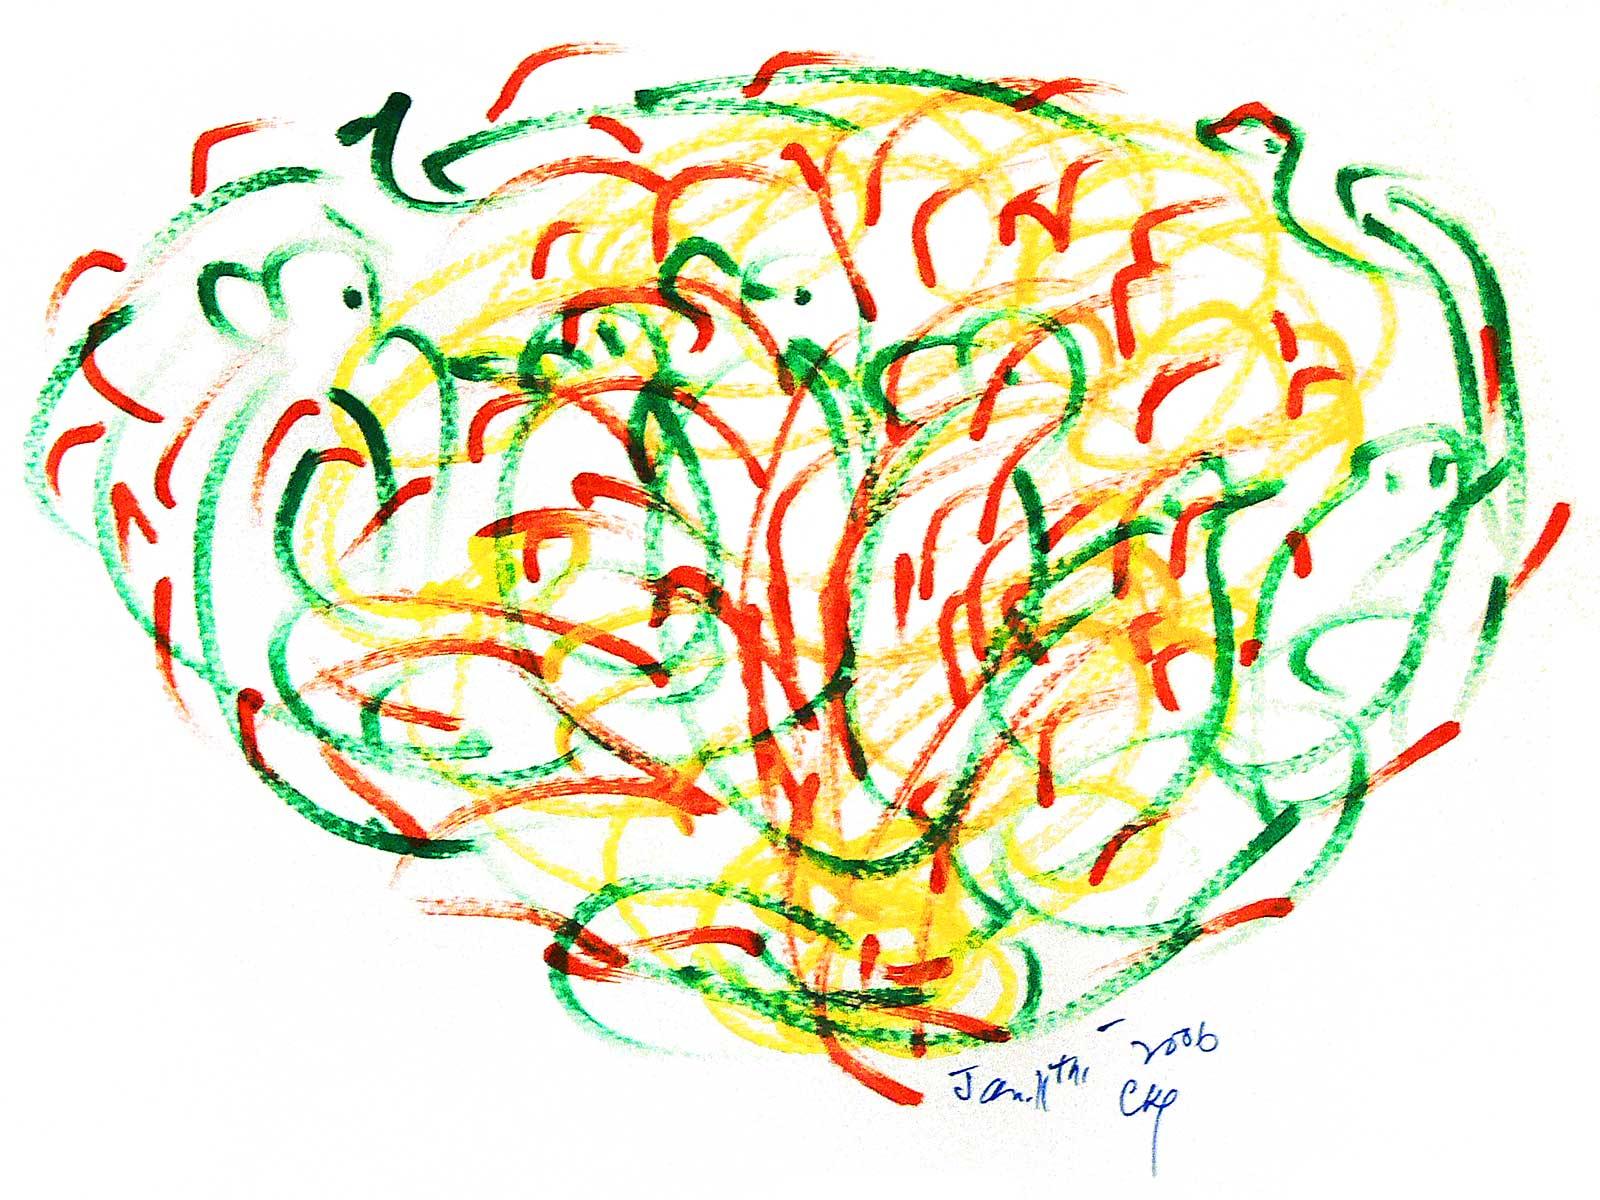 Bird-Drawing-by-Sri-Chinmoy-11-1-2006-2